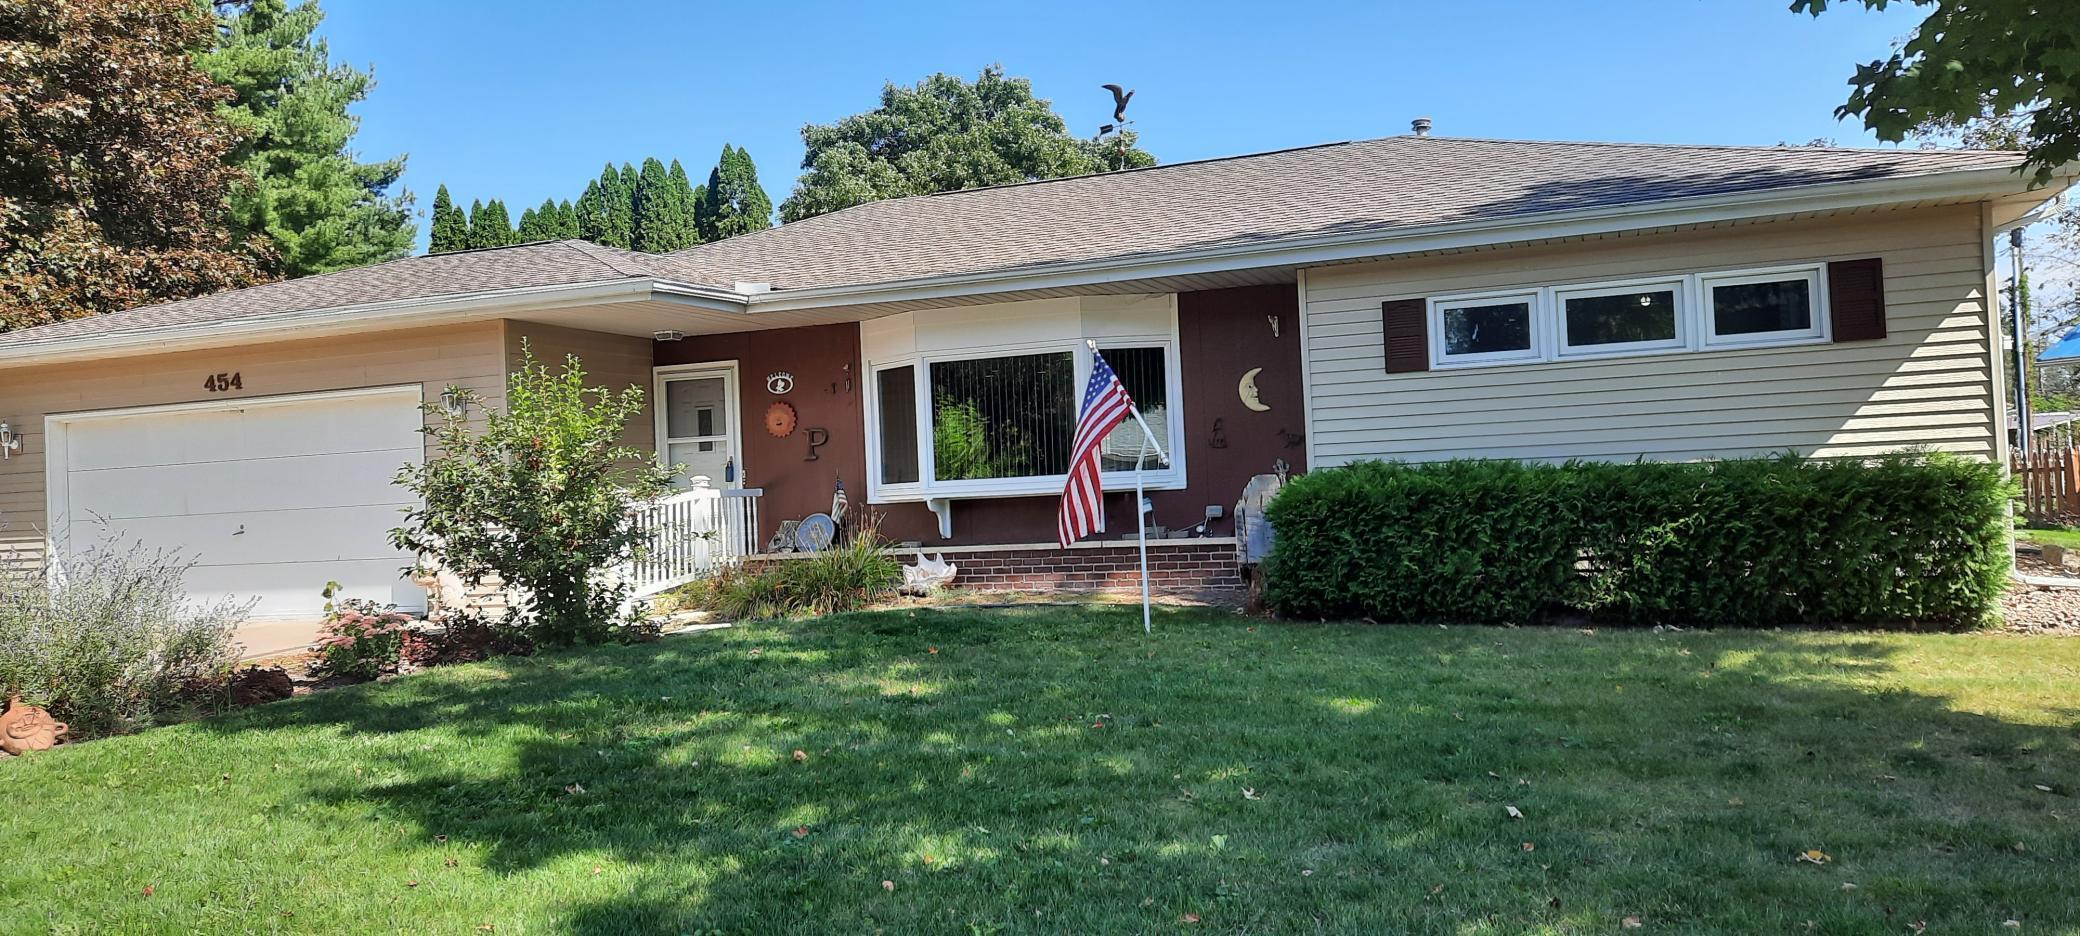 454 Glenview Drive Property Photo 1